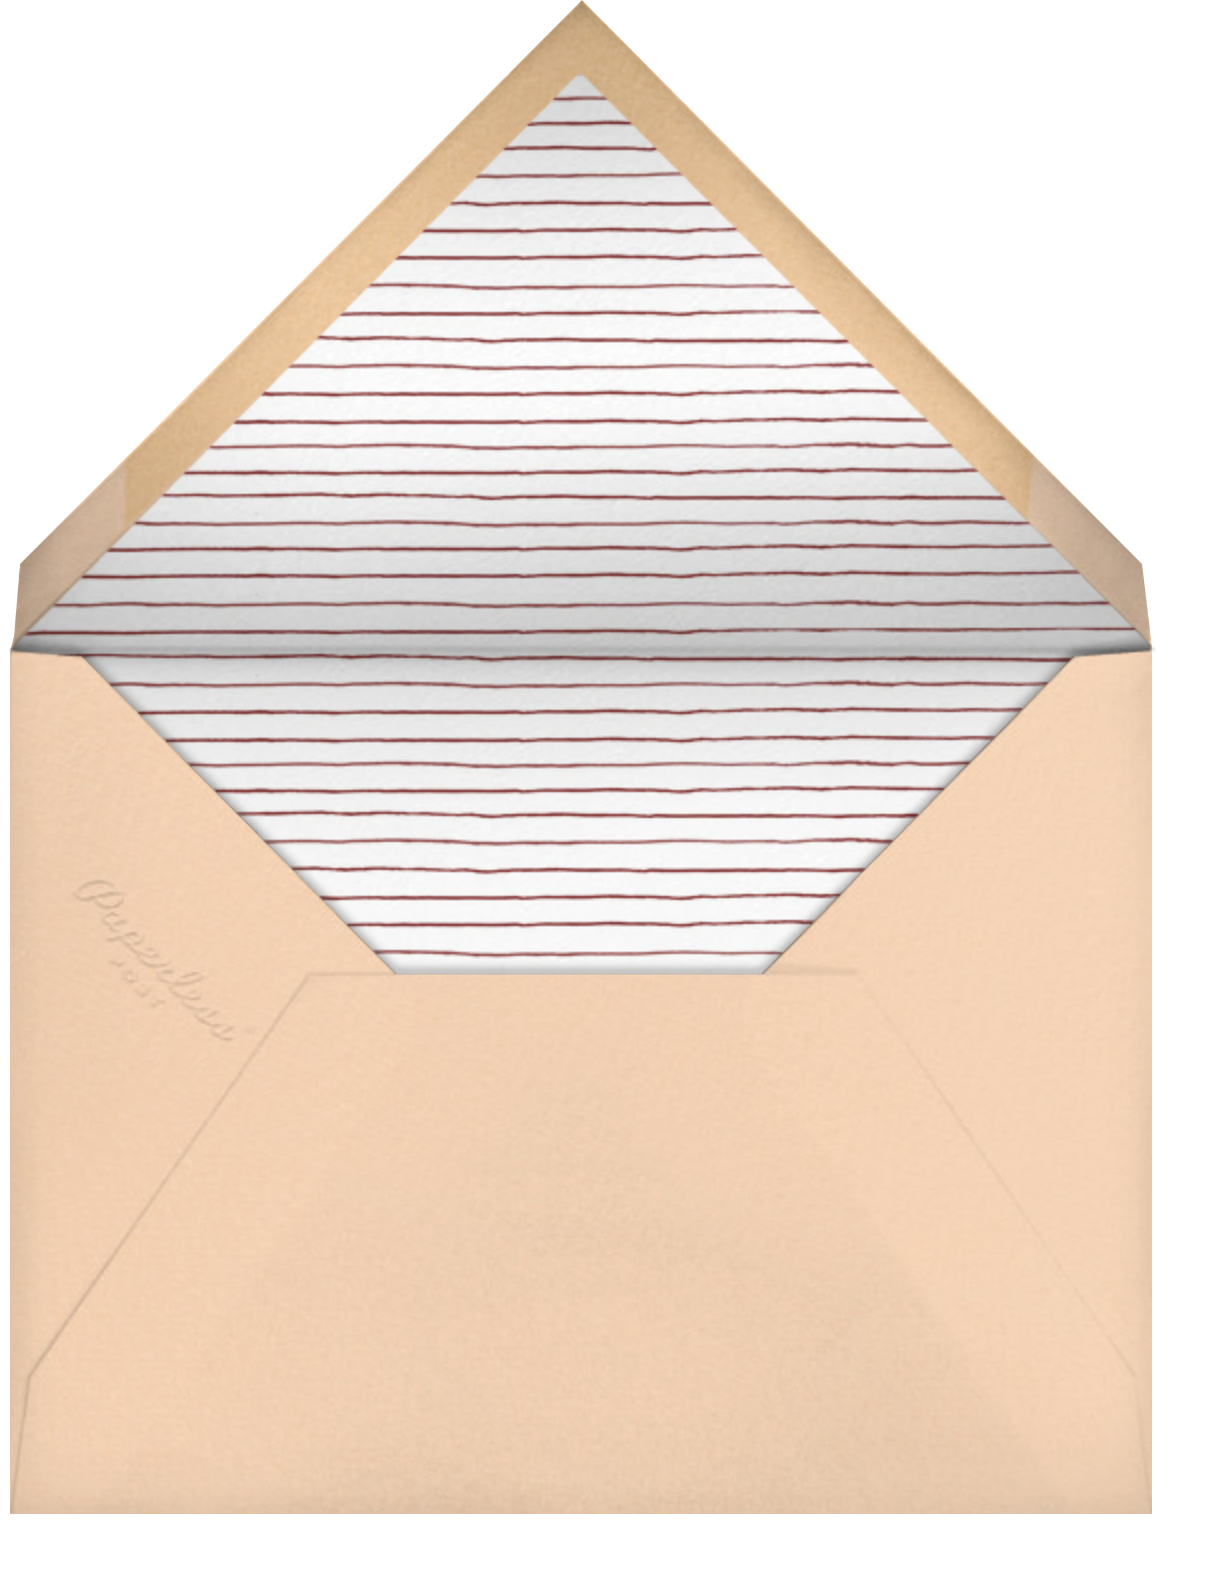 Watercolored Eggs - Paperless Post - Envelope